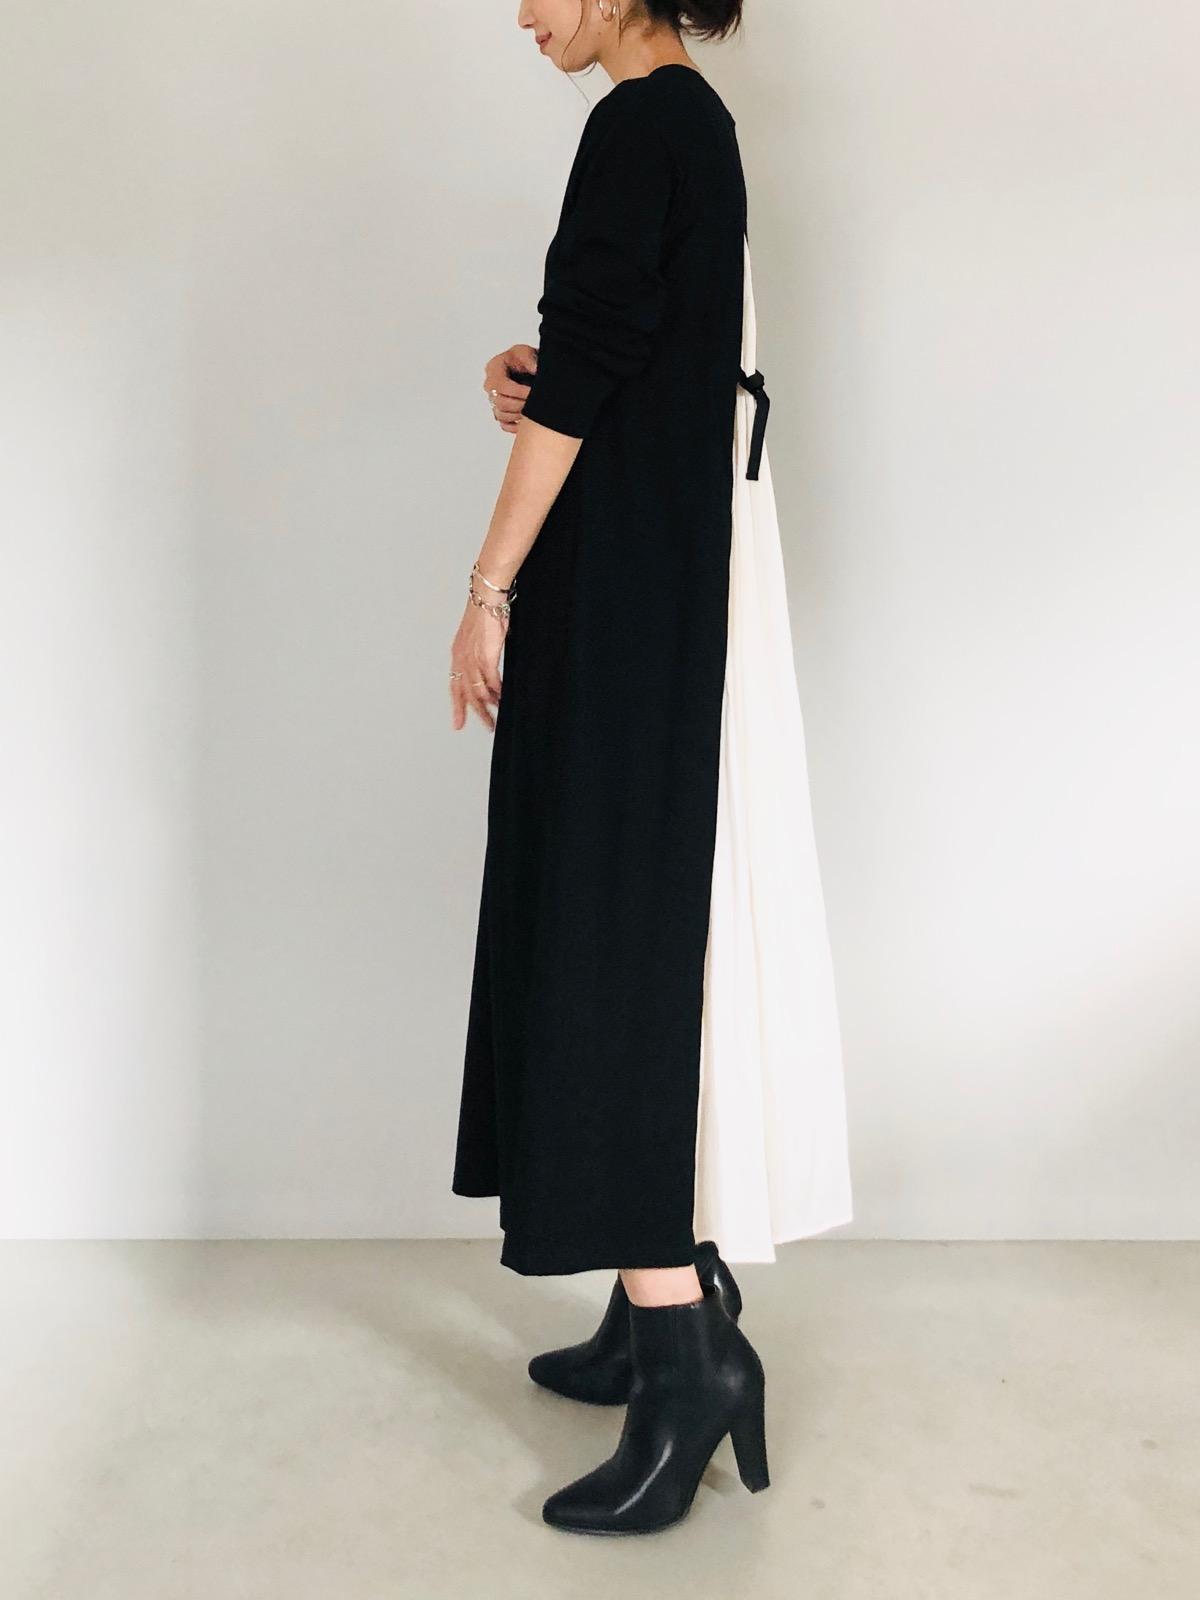 SELECT(セレクト) 長袖異素材バックサテンカットロングワンピース